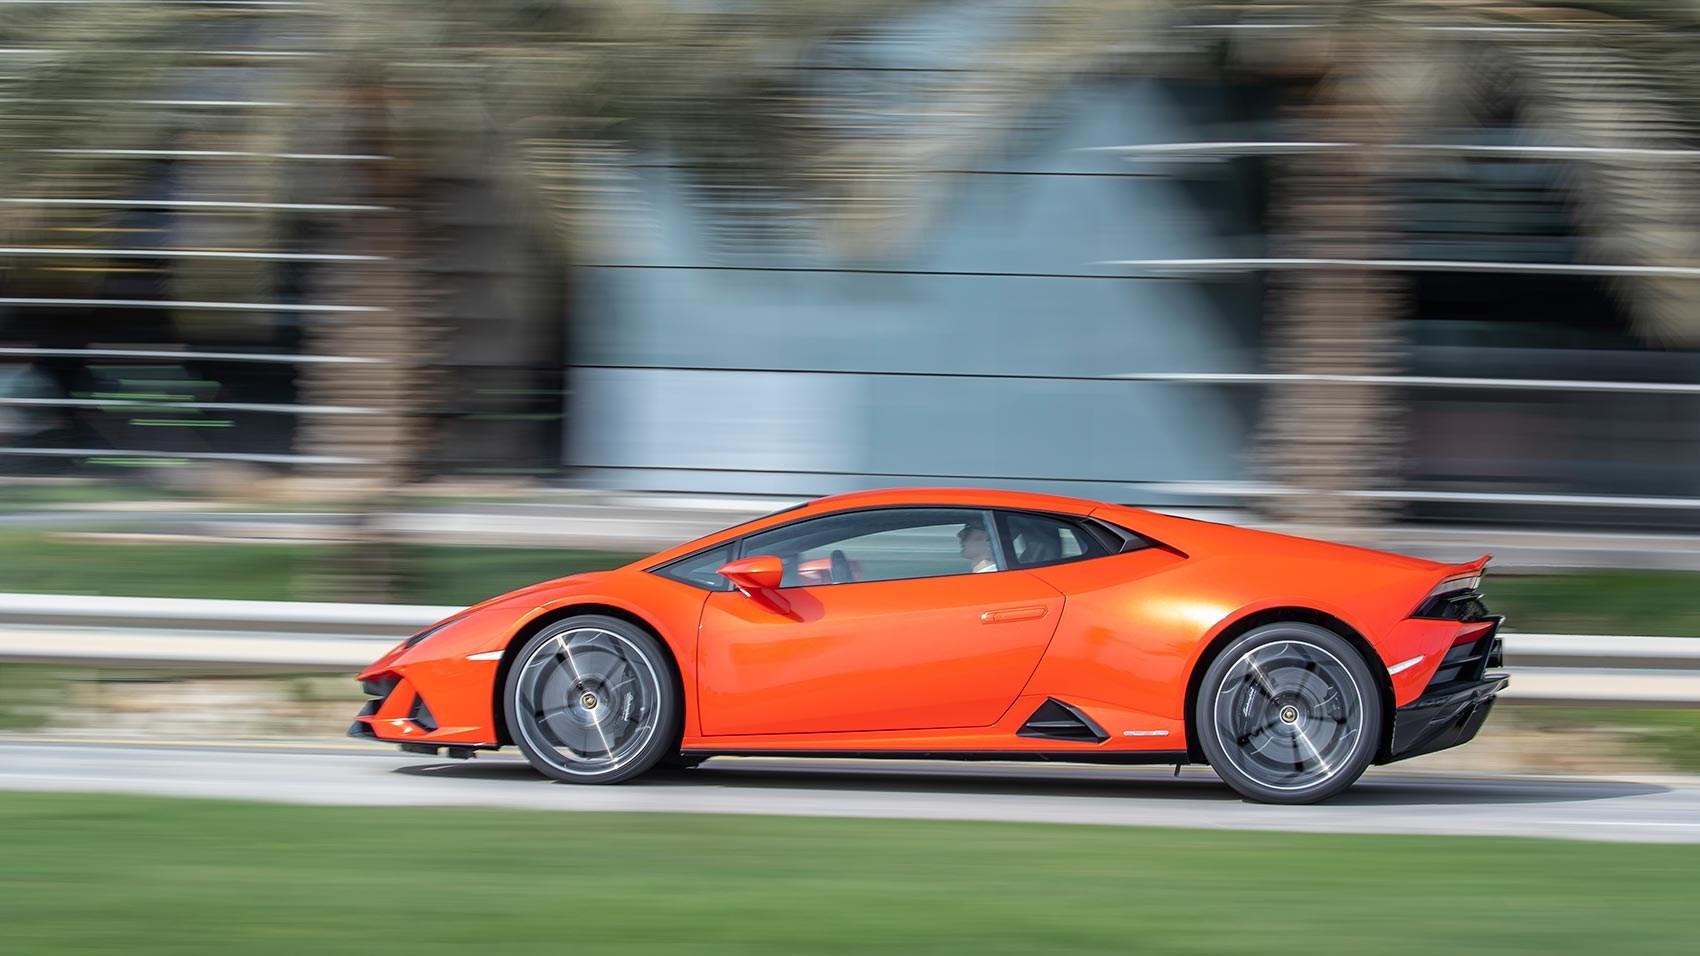 Lambo For Sale >> Lamborghini Huracan Evo review | CAR Magazine